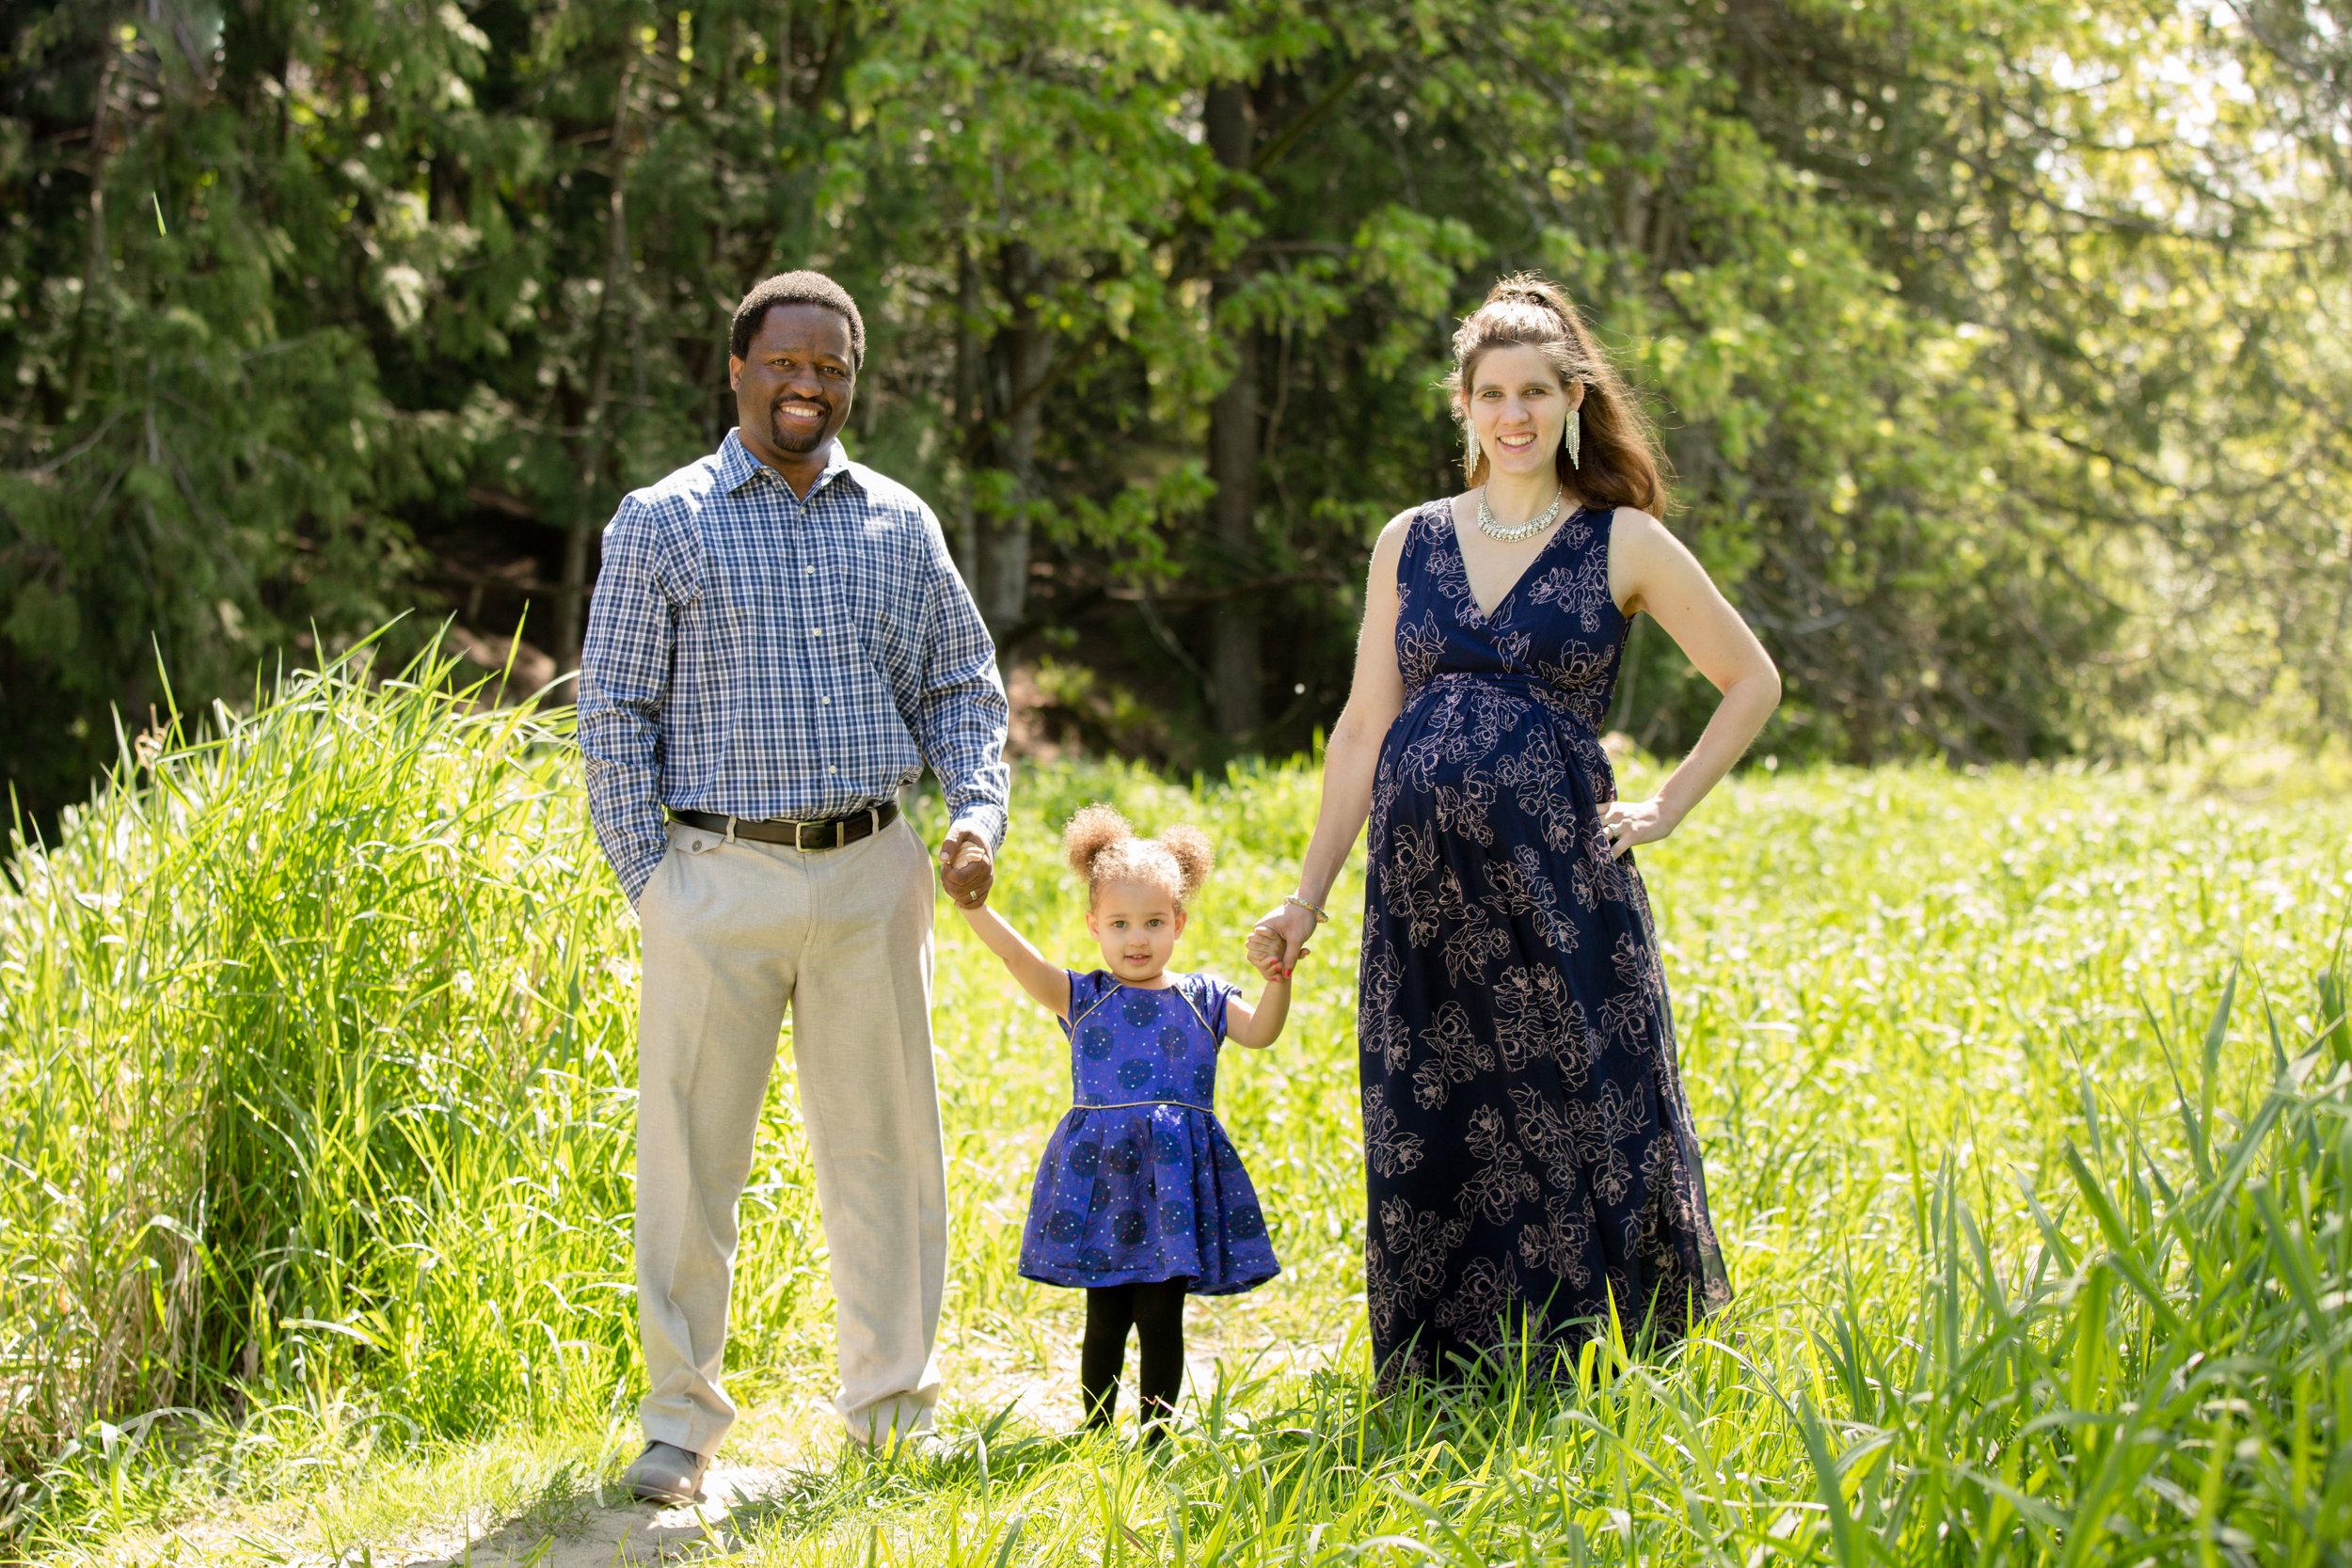 Snohomish County Family Photographer | Marysville WA